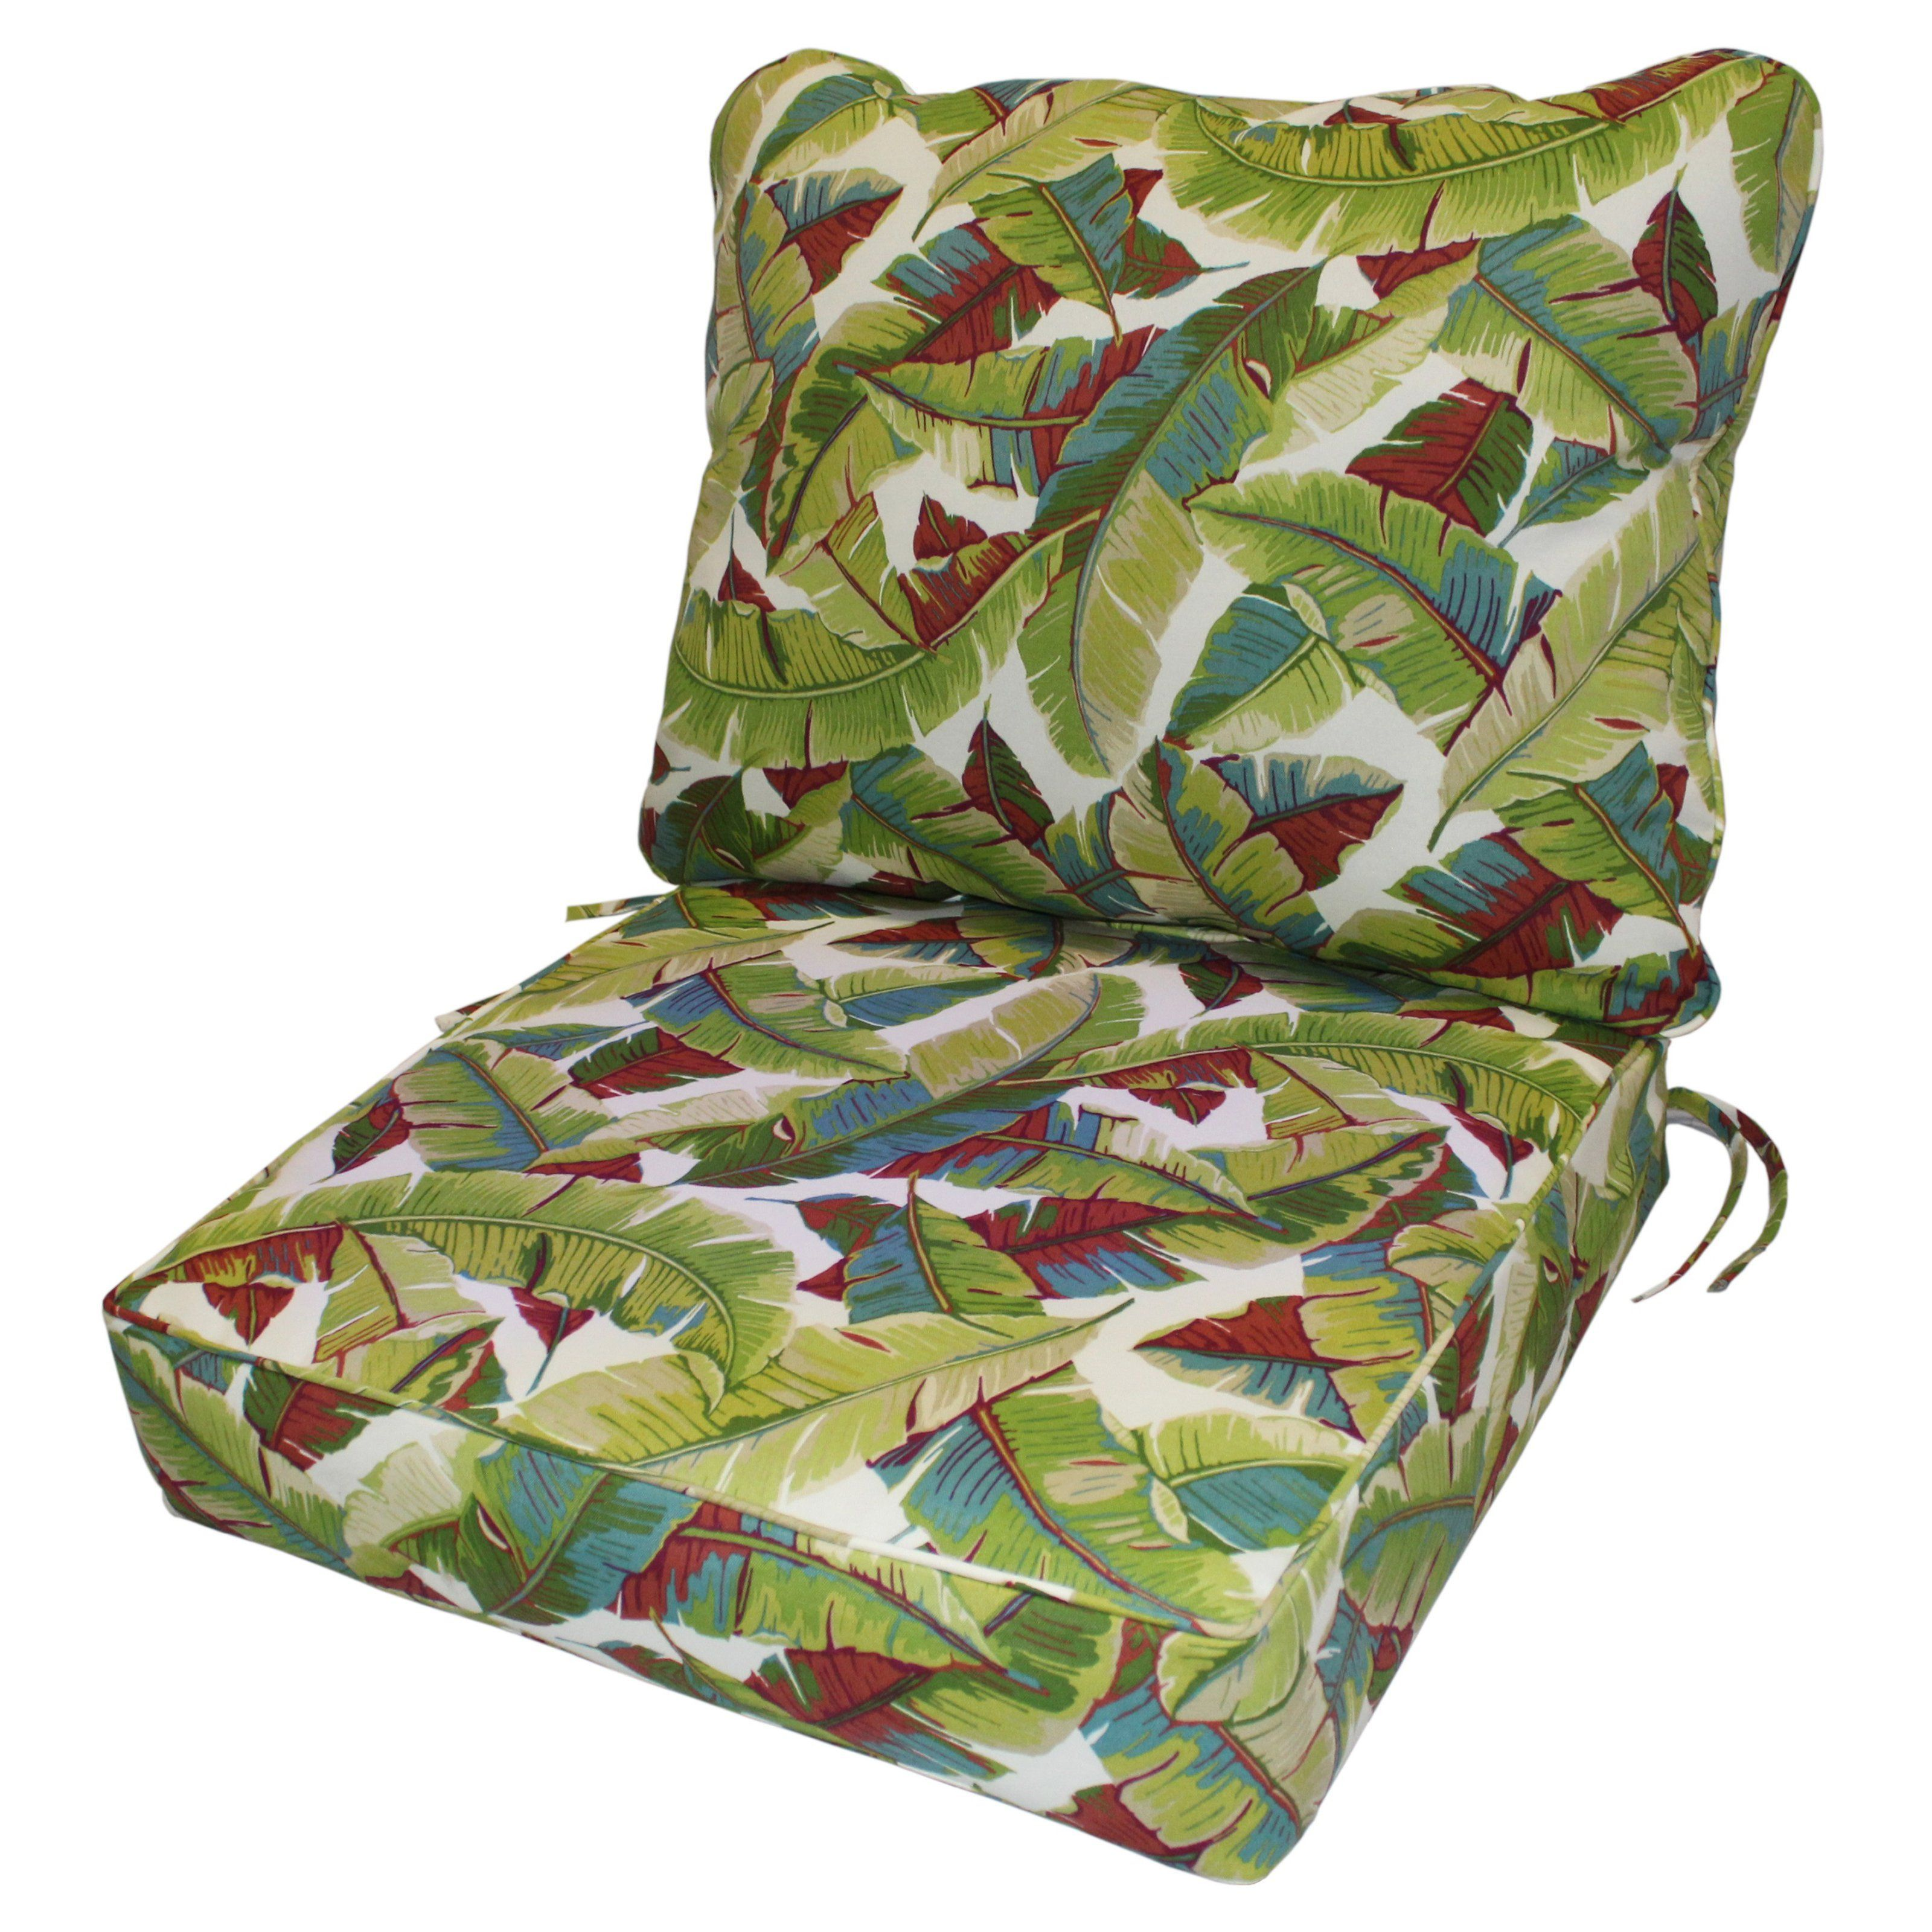 Greendale Home Fashions Deep Seat Cushion Set Palm Multi Oc7820 Palm Multi Deep Seat Cushions Outdoor Deep Seat Cushions Outdoor Cushions